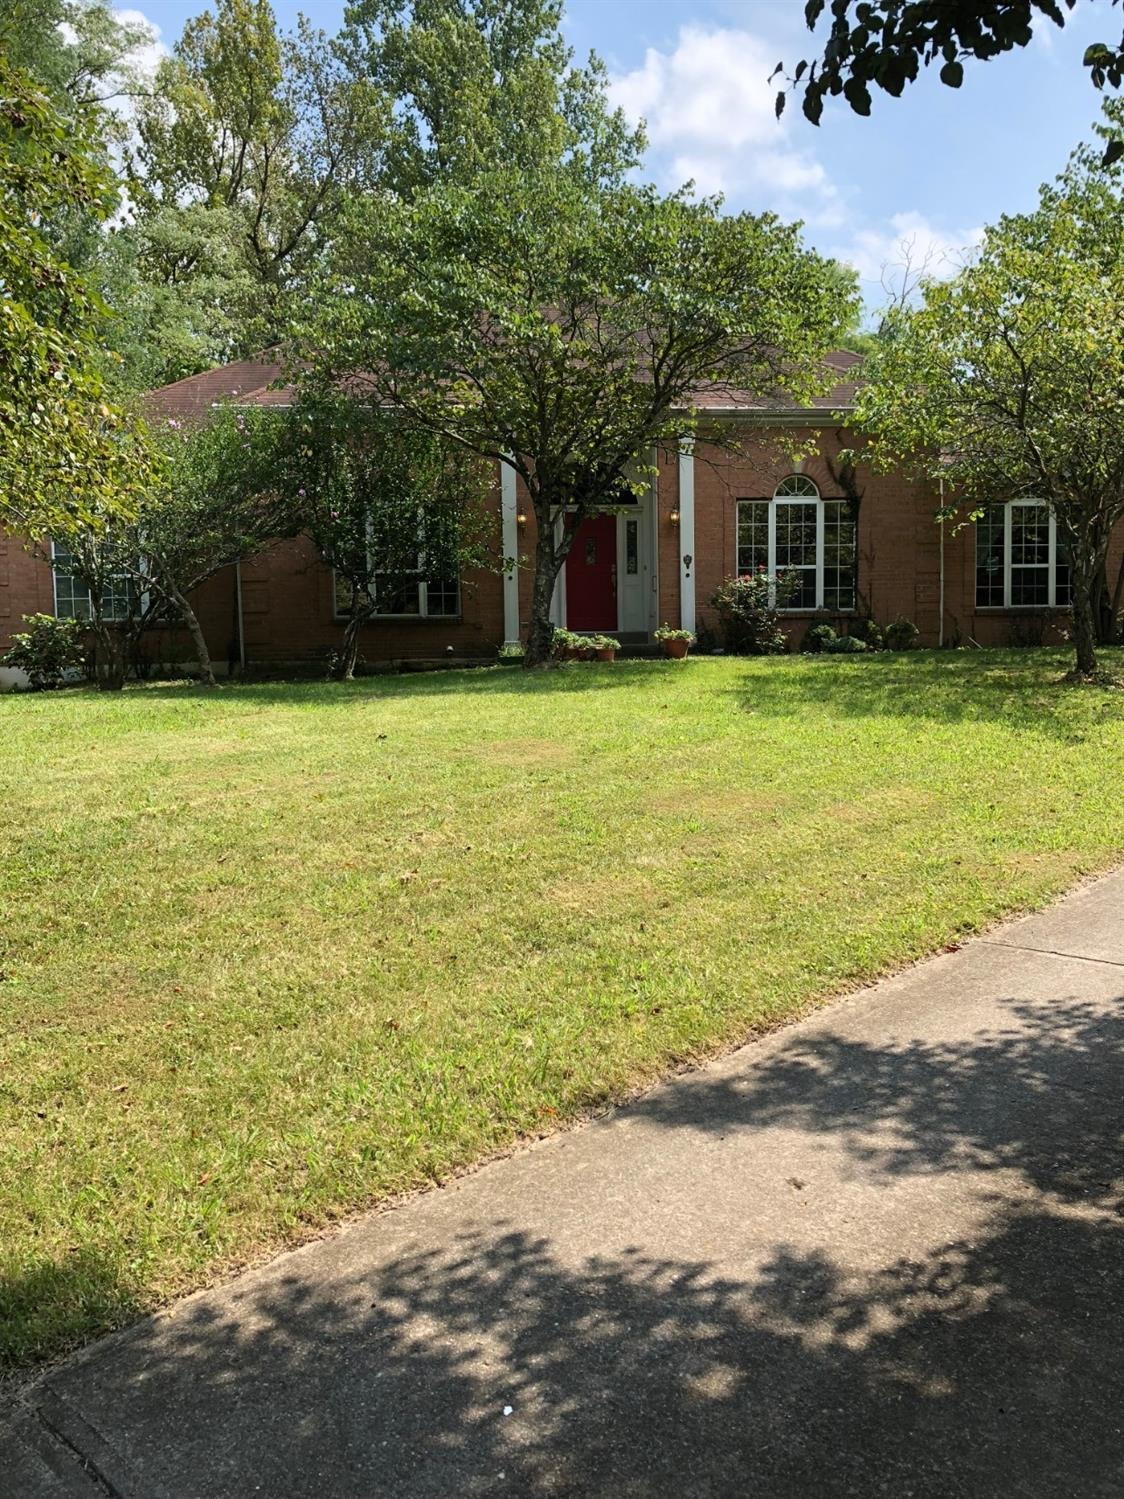 Property for sale at 631 Greenwood Avenue, Cincinnati,  OH 45229